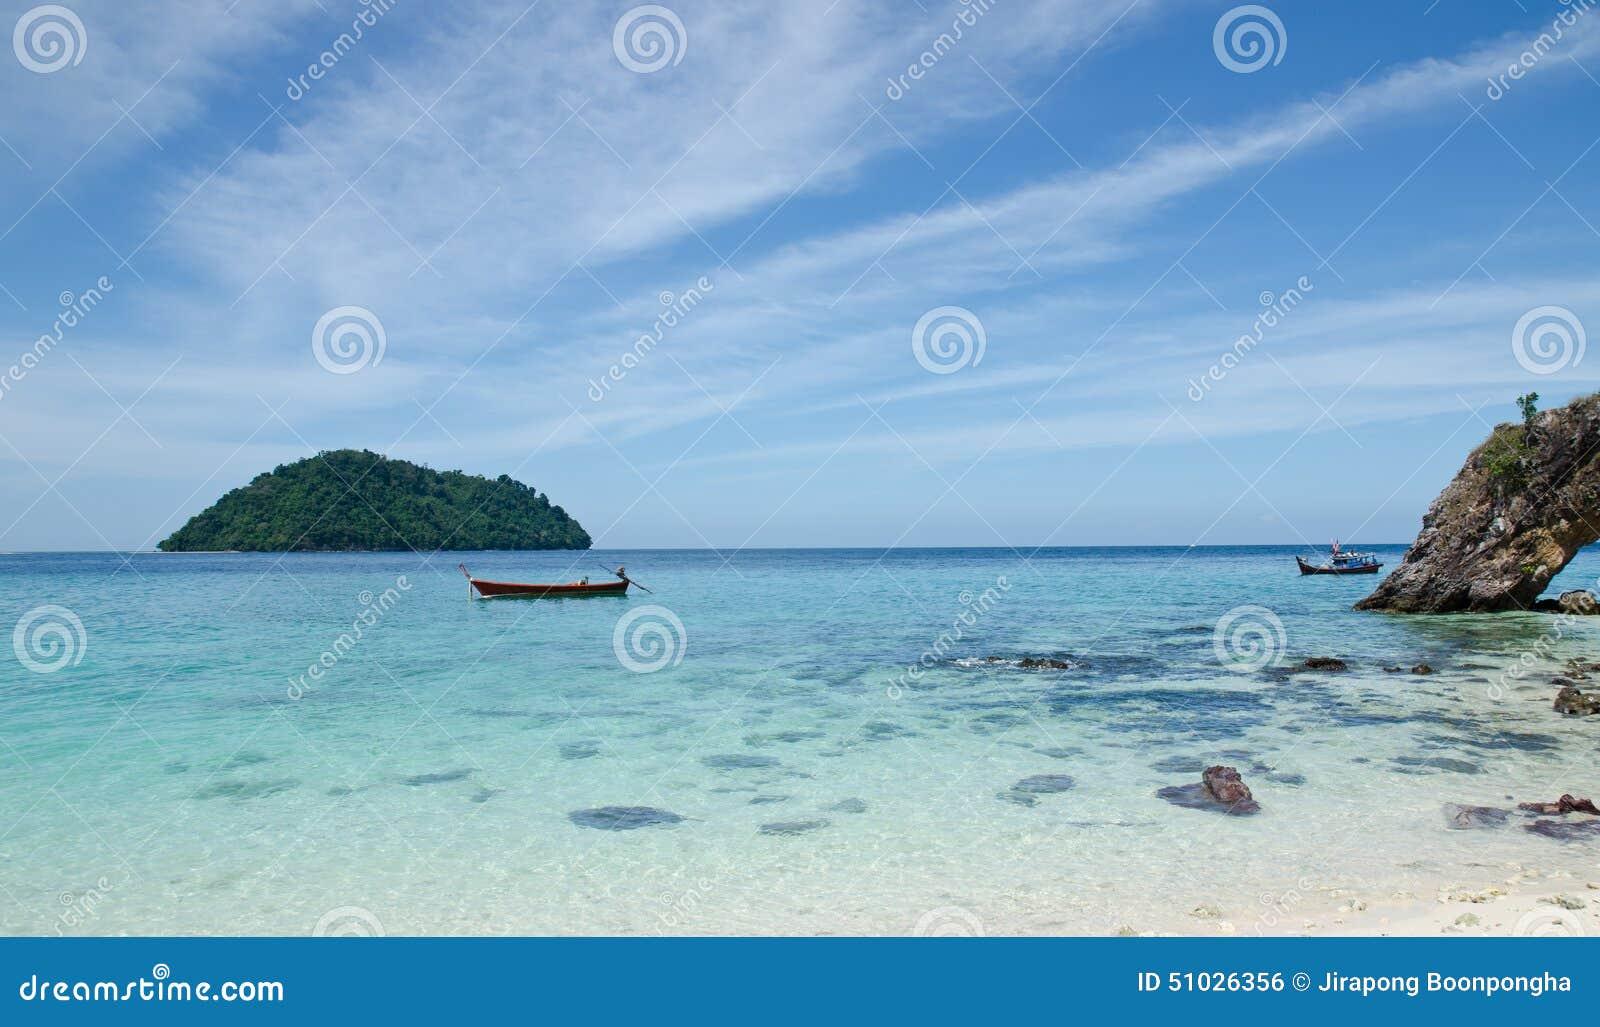 White Sand Beach With Boats and white sand beach at Li